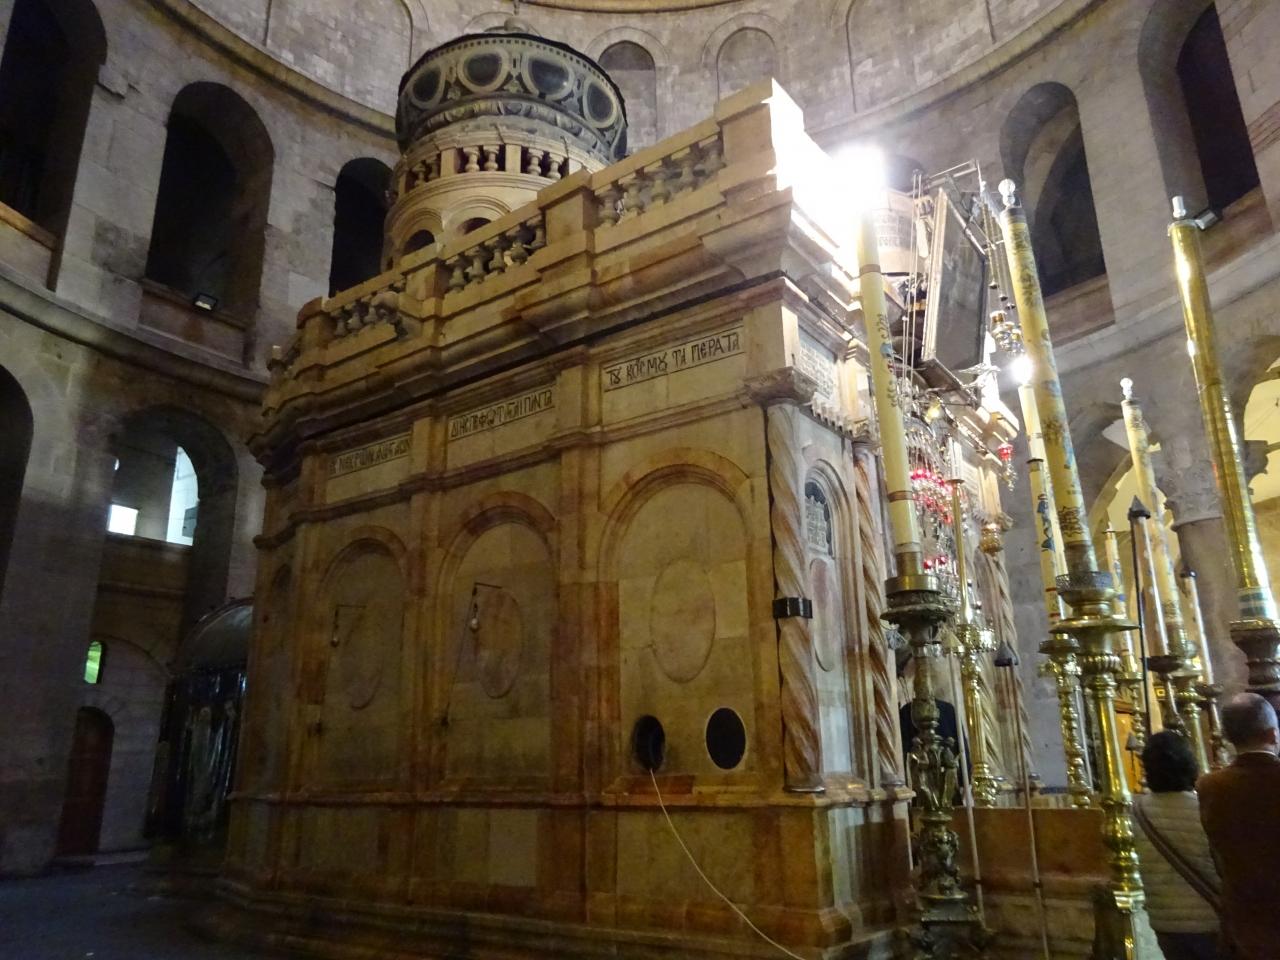 聖墳墓教会の画像 p1_19